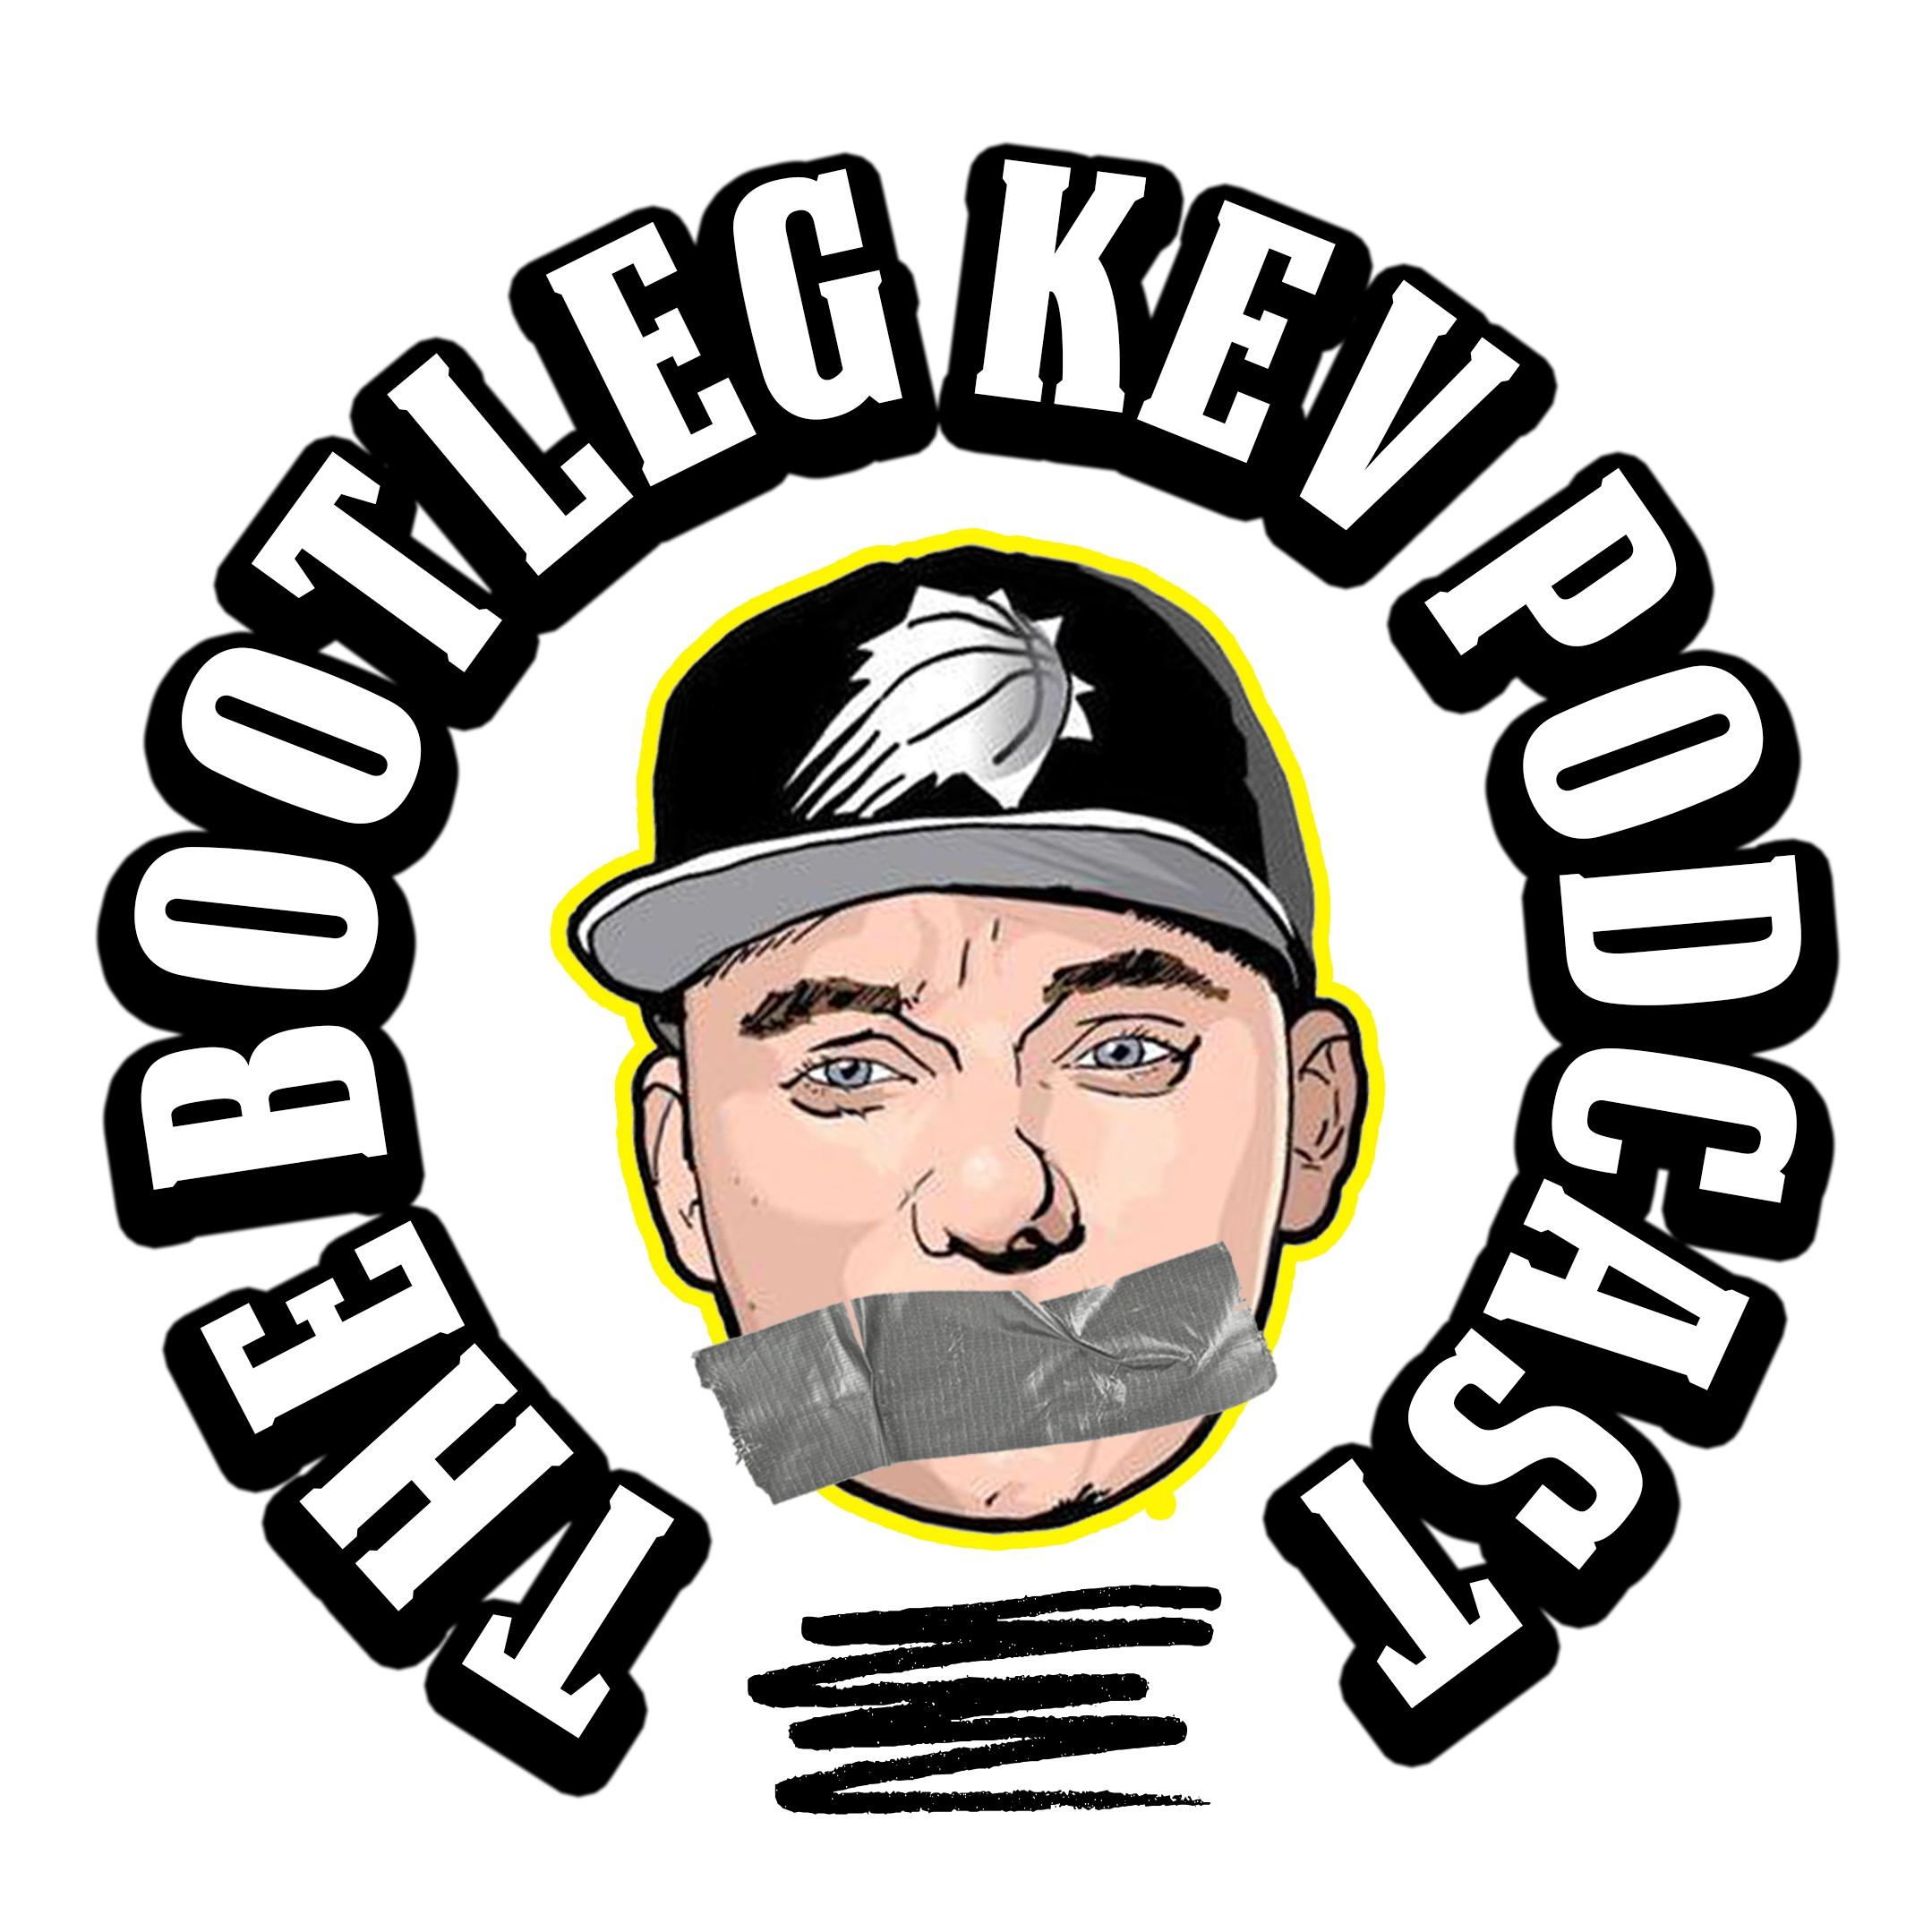 @thebootlegkevpodcast Profile Image | Linktree